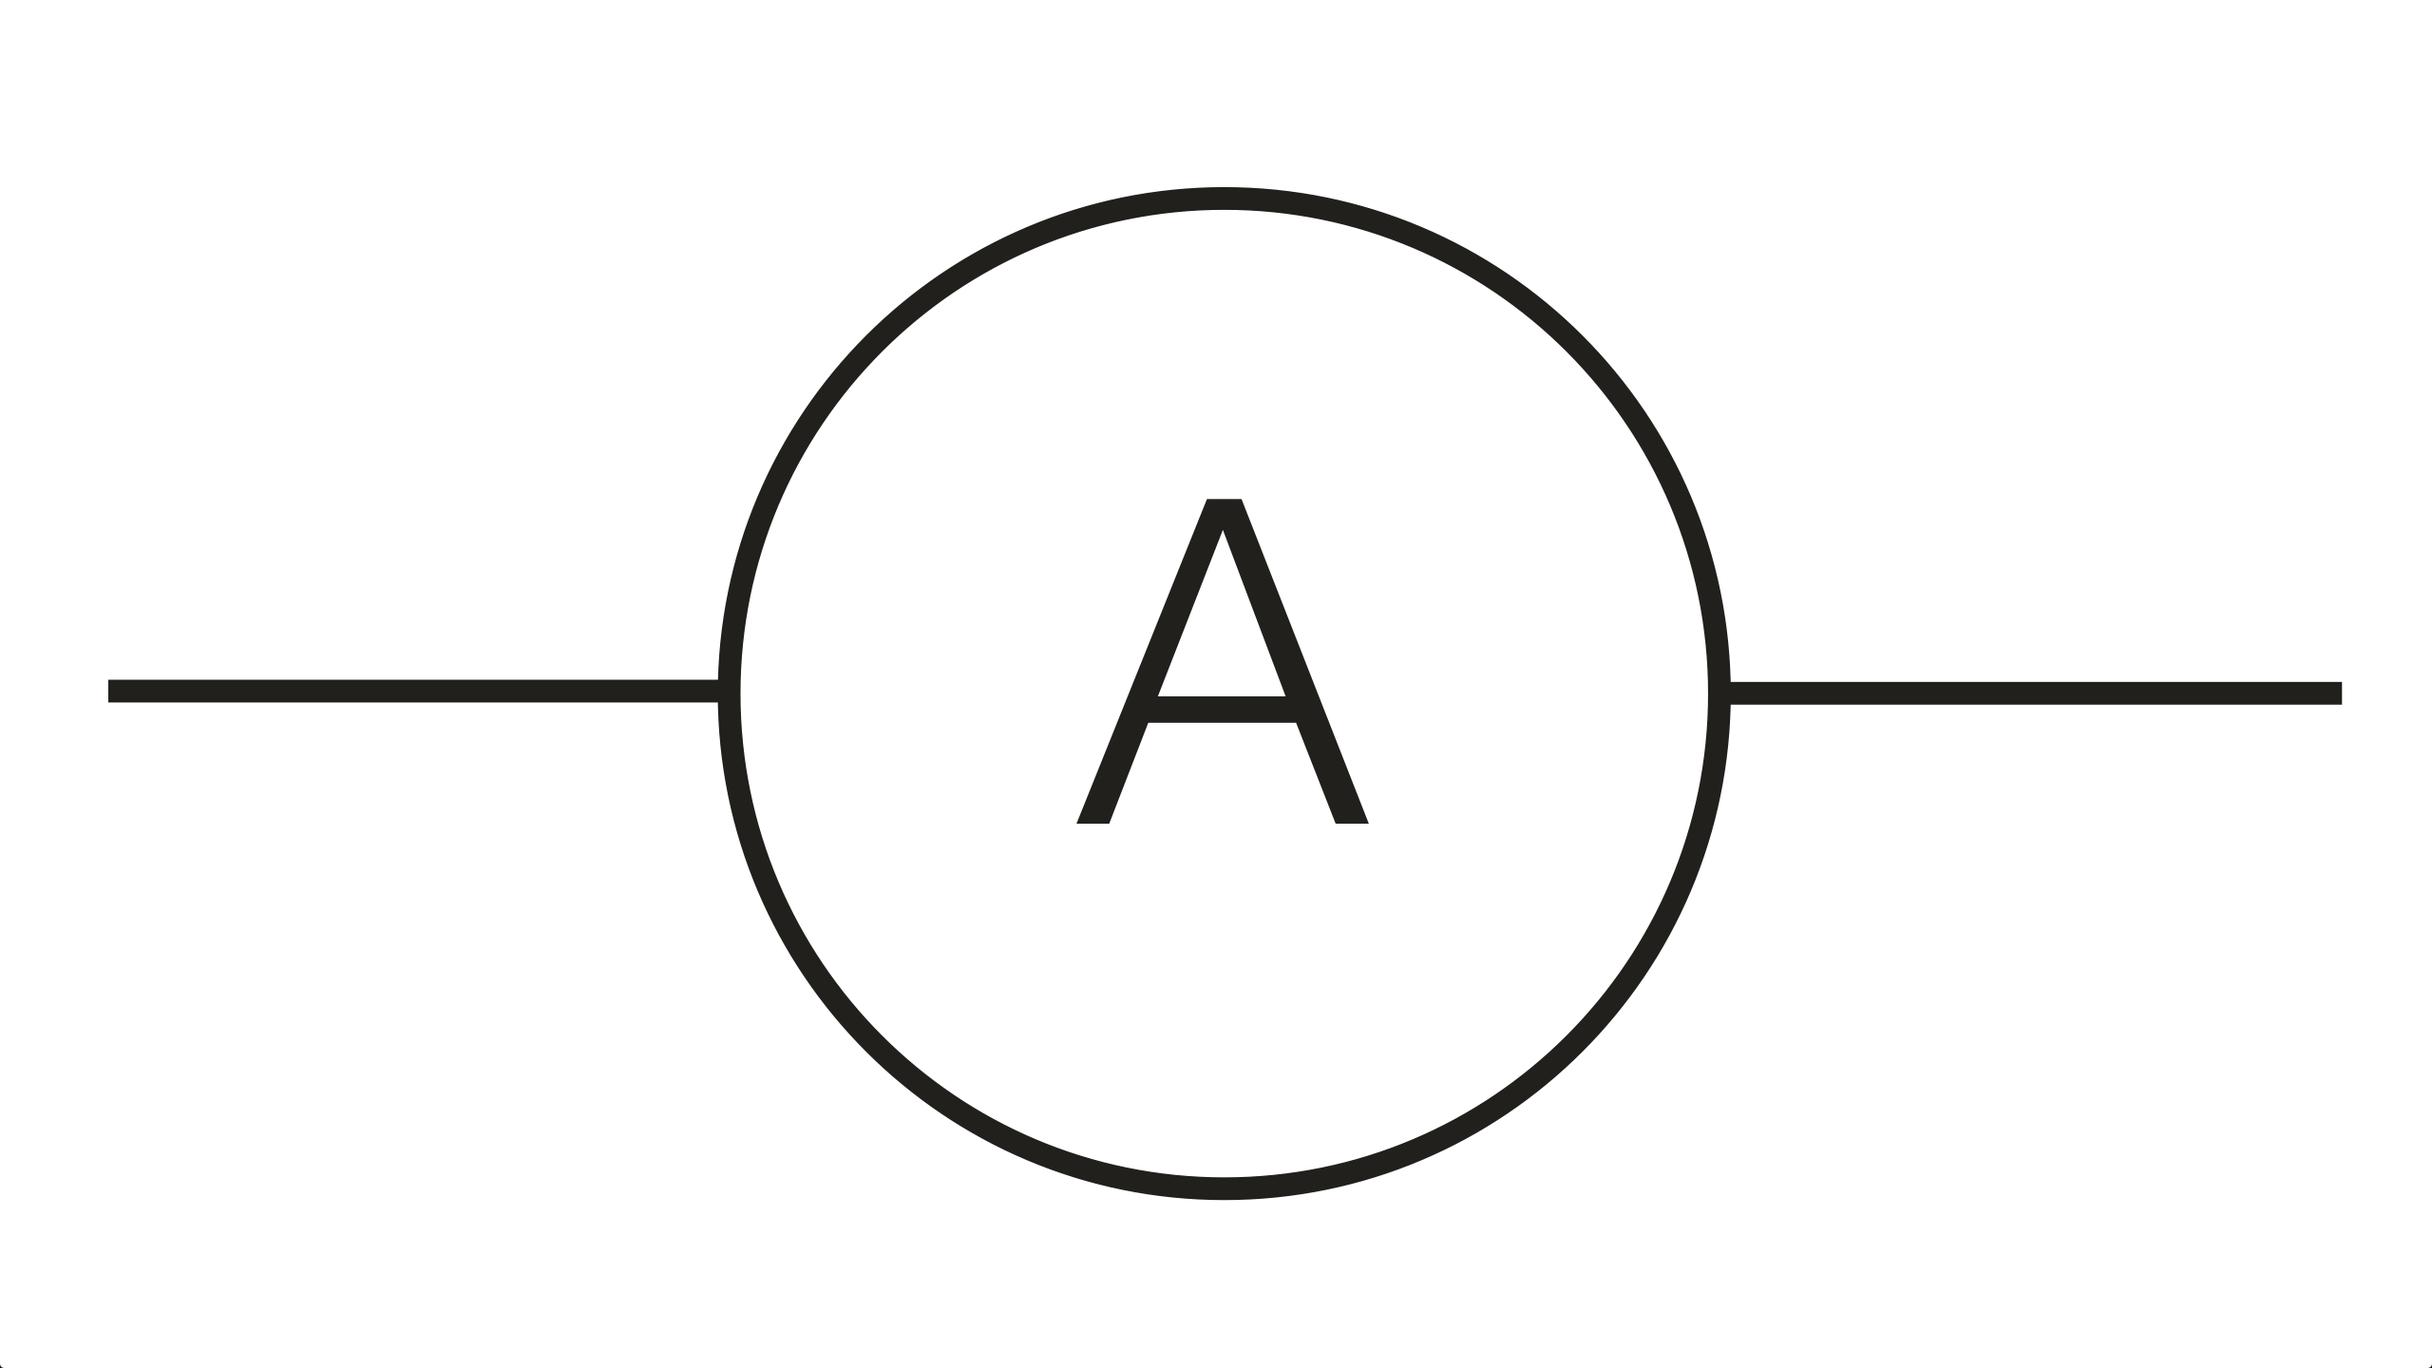 Ammeter Clip Art : Ammeter symbol clipart best